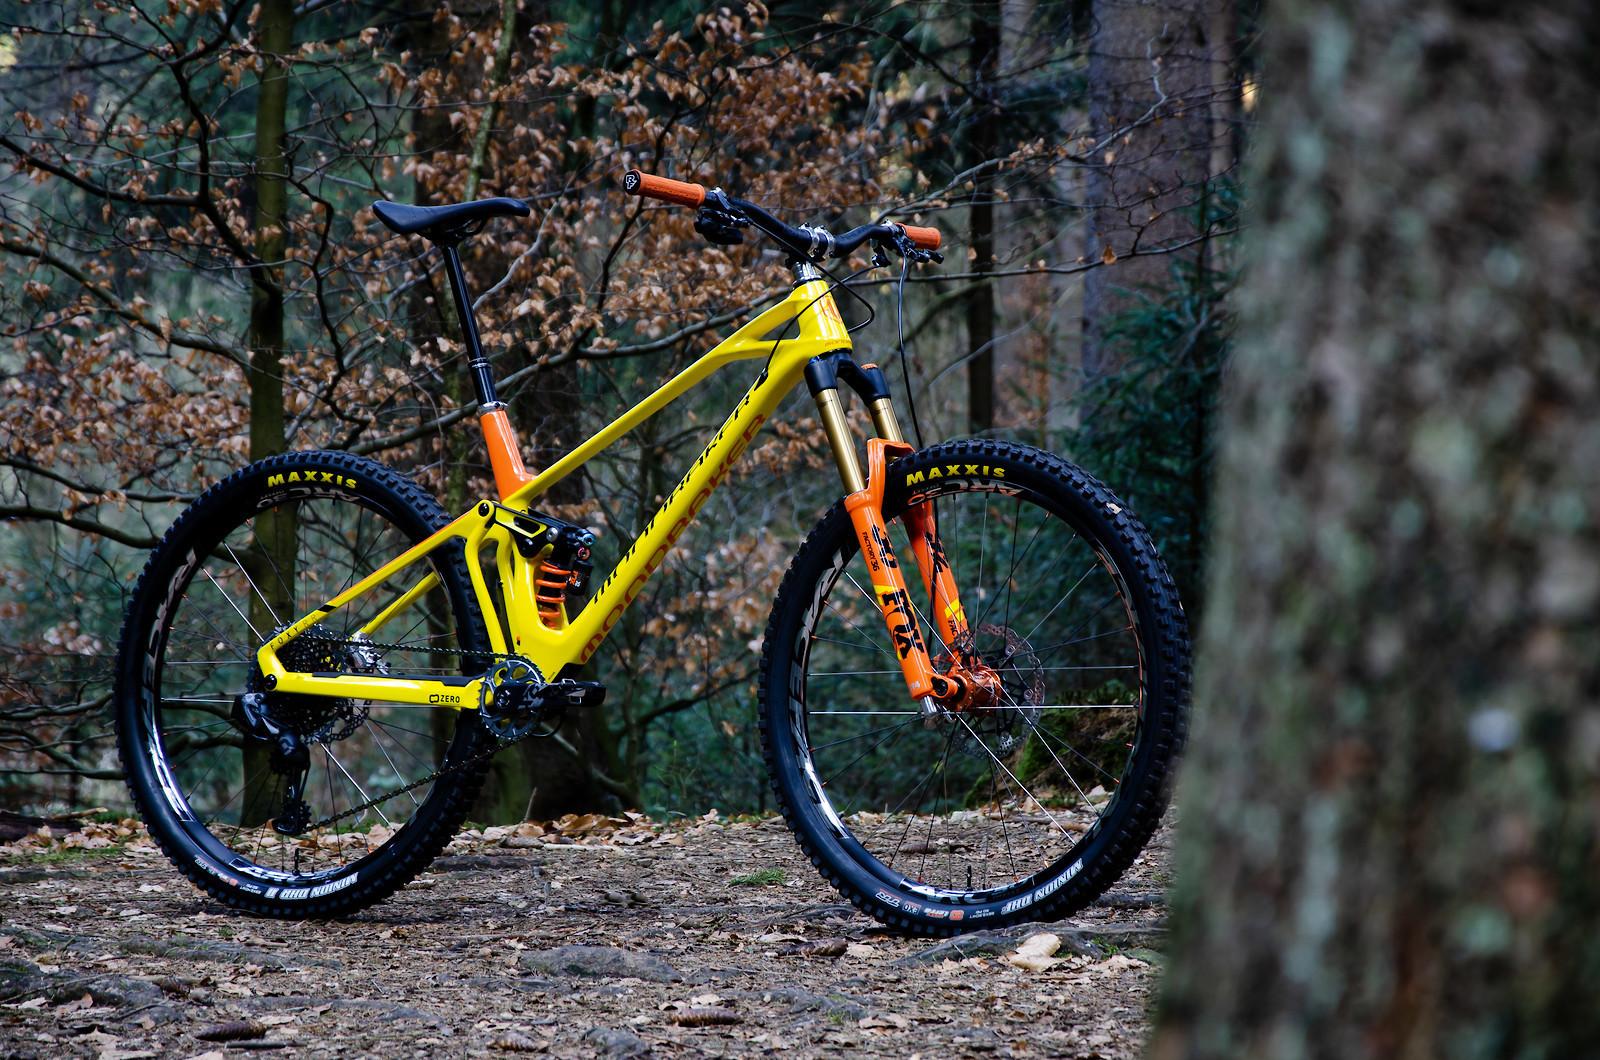 Mondraker Foxy RR 29 - 2019 Vital Bike of the Day Collection - Mountain Biking Pictures - Vital MTB